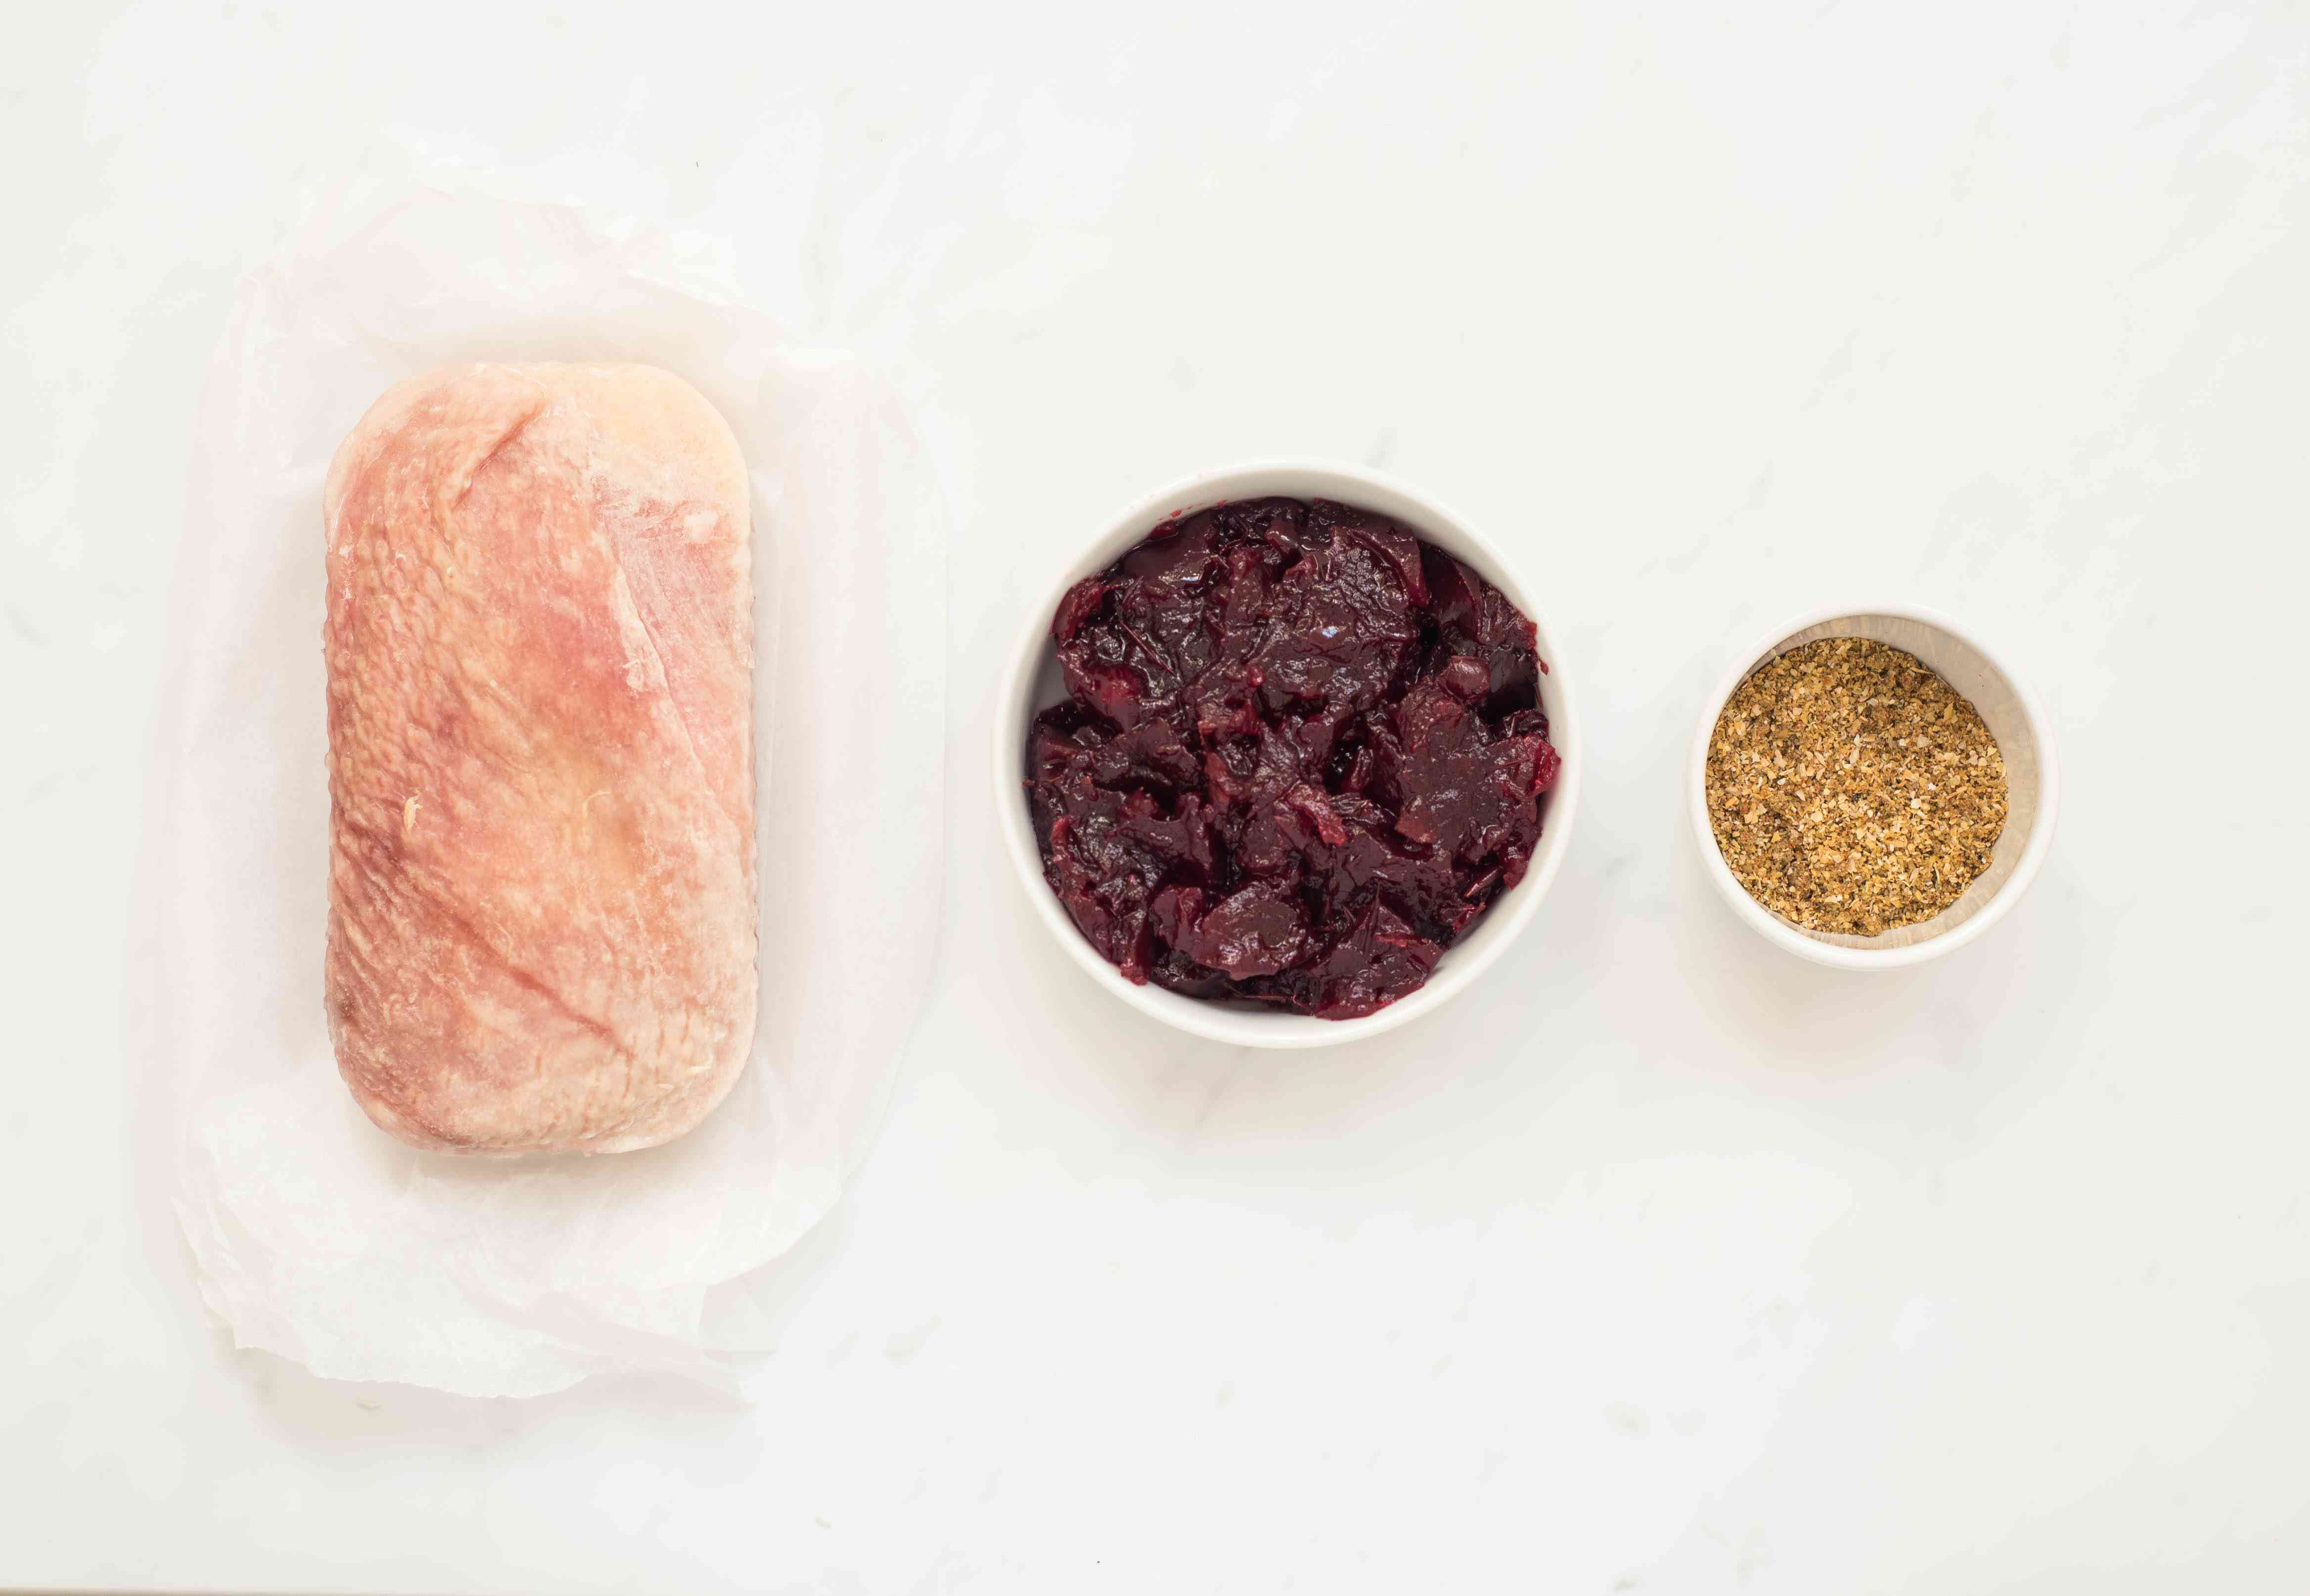 Ingredients for crockpot turkey